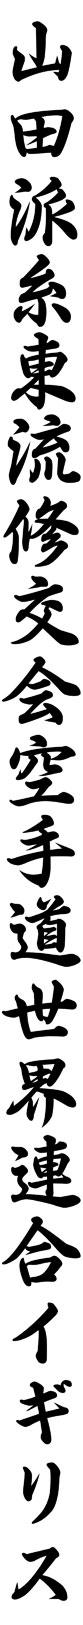 01---yssku_kanji_blk_thick_vert